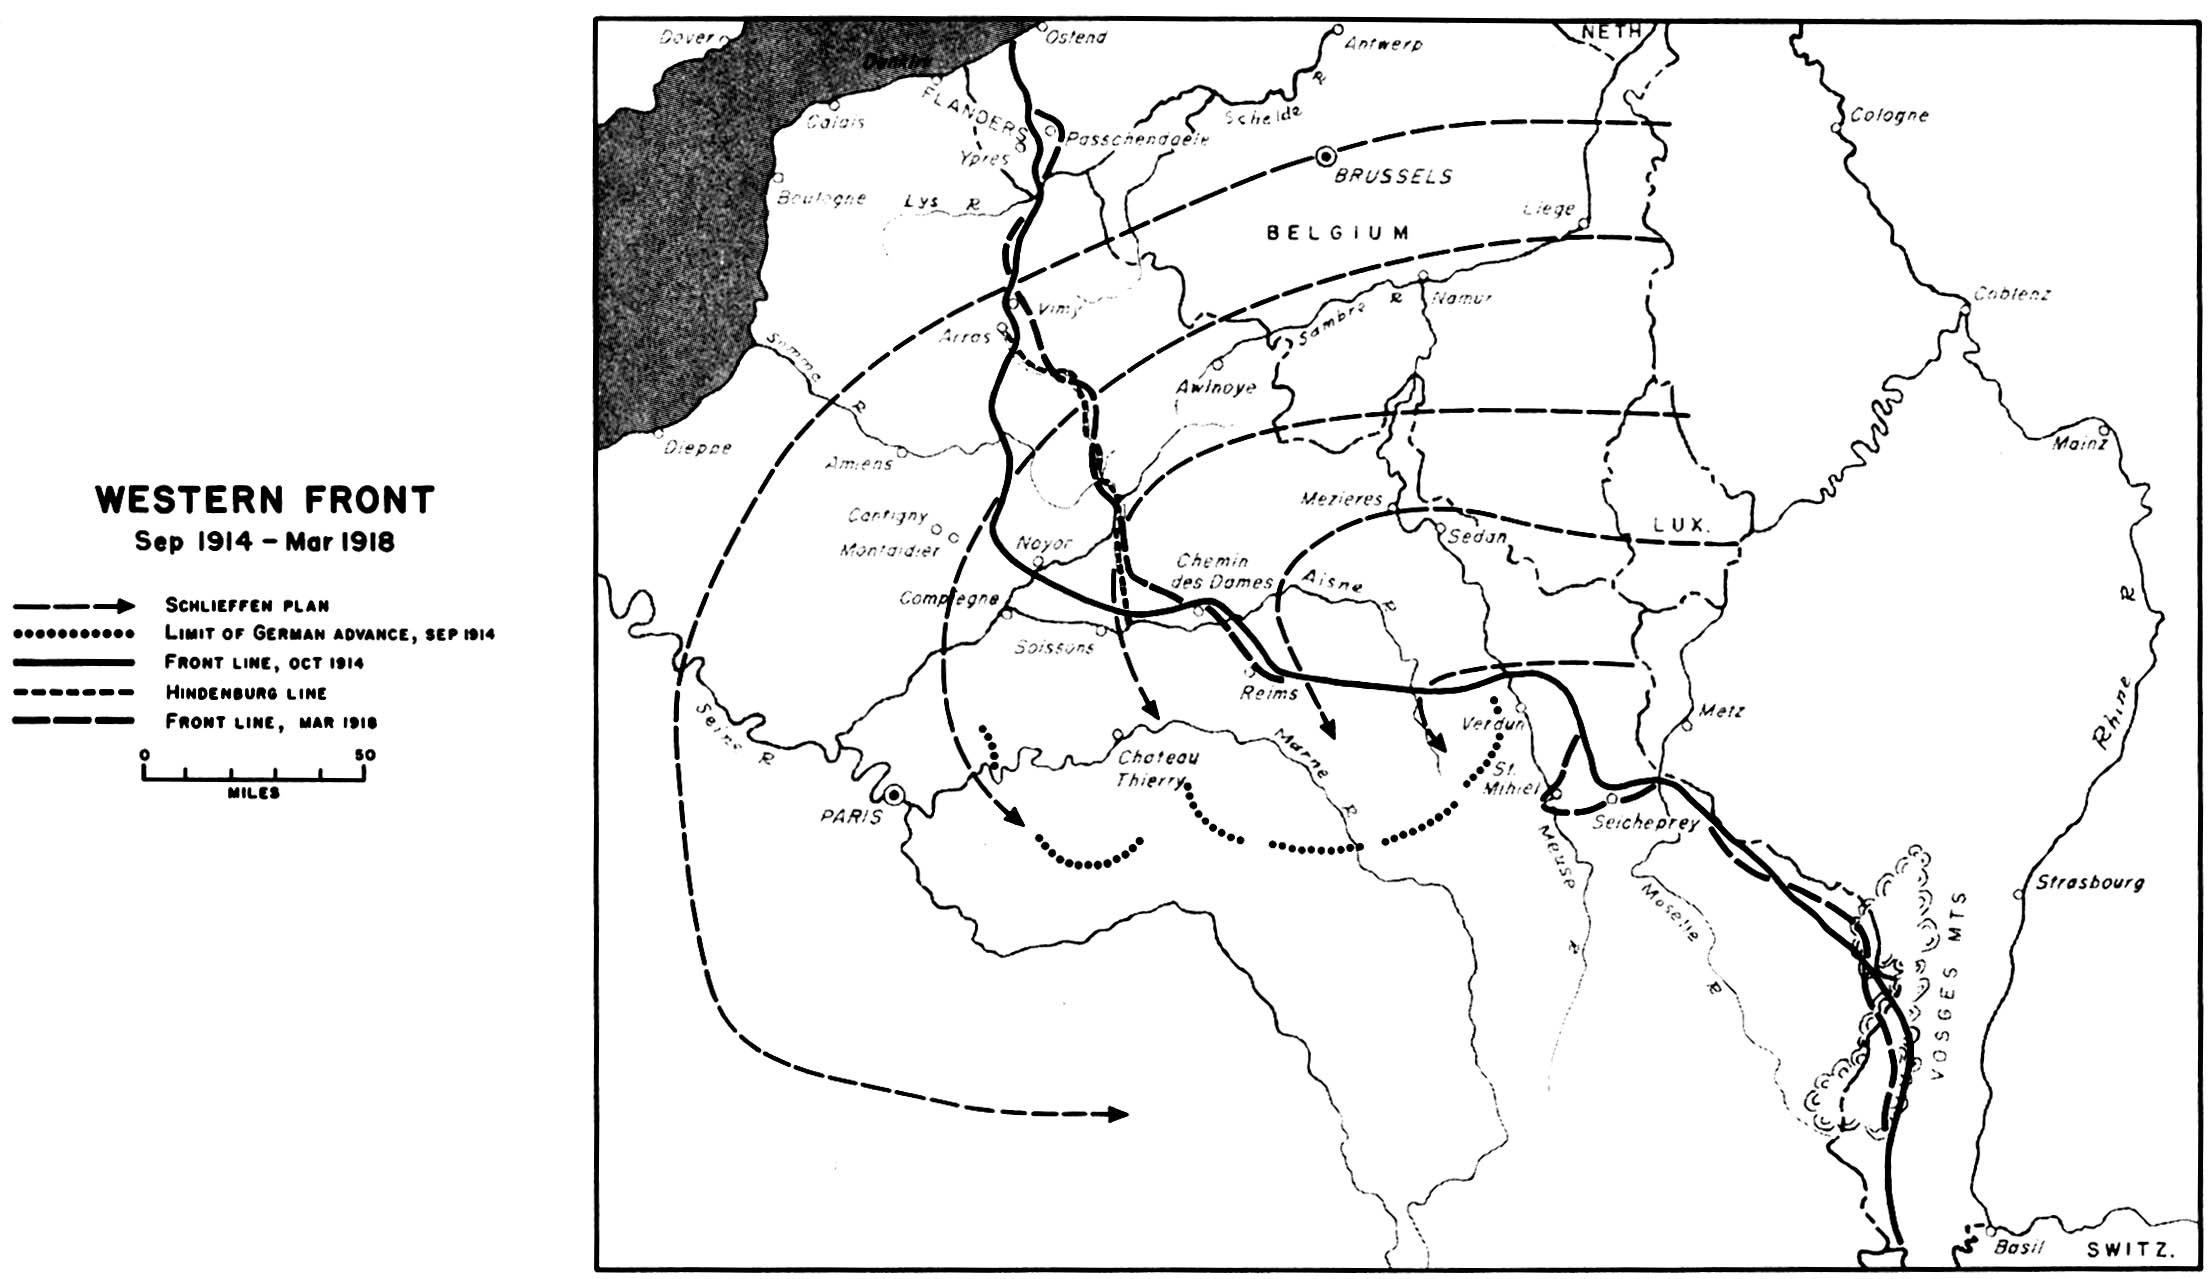 Frente Occidental, Primera Guerra Mundial, Sept. 1914 - Marzo 1918